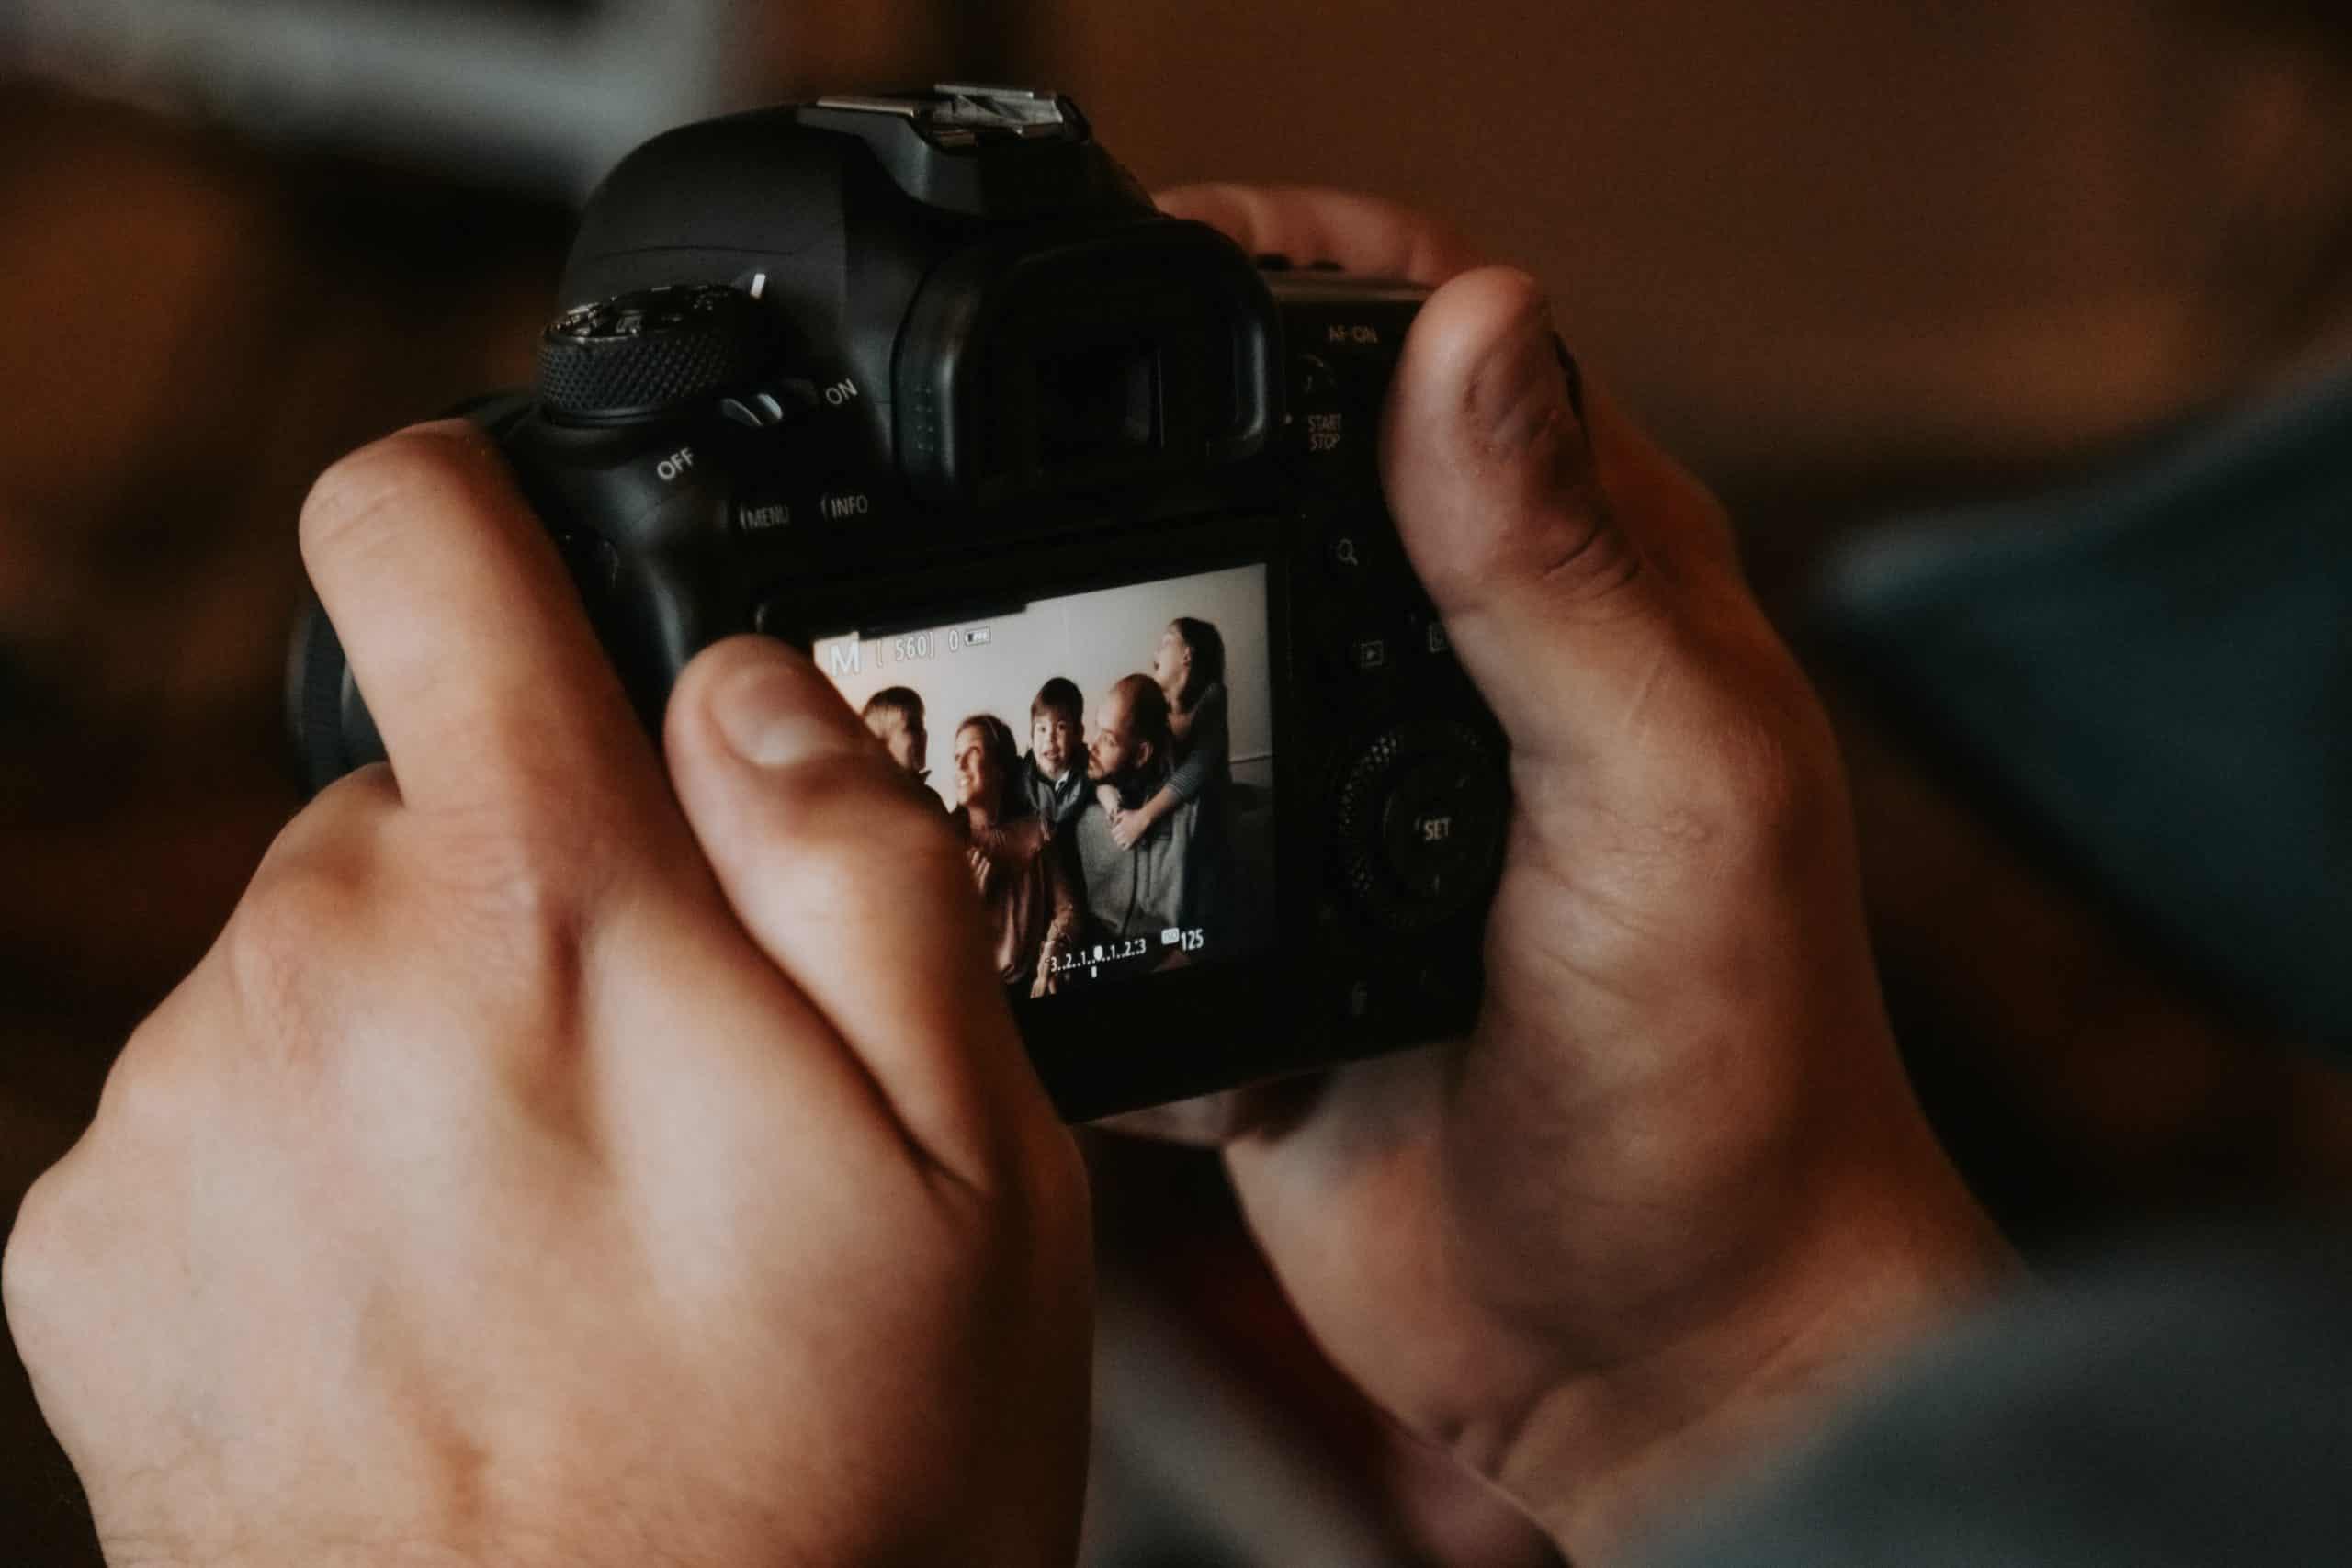 Aaron Jay Photography